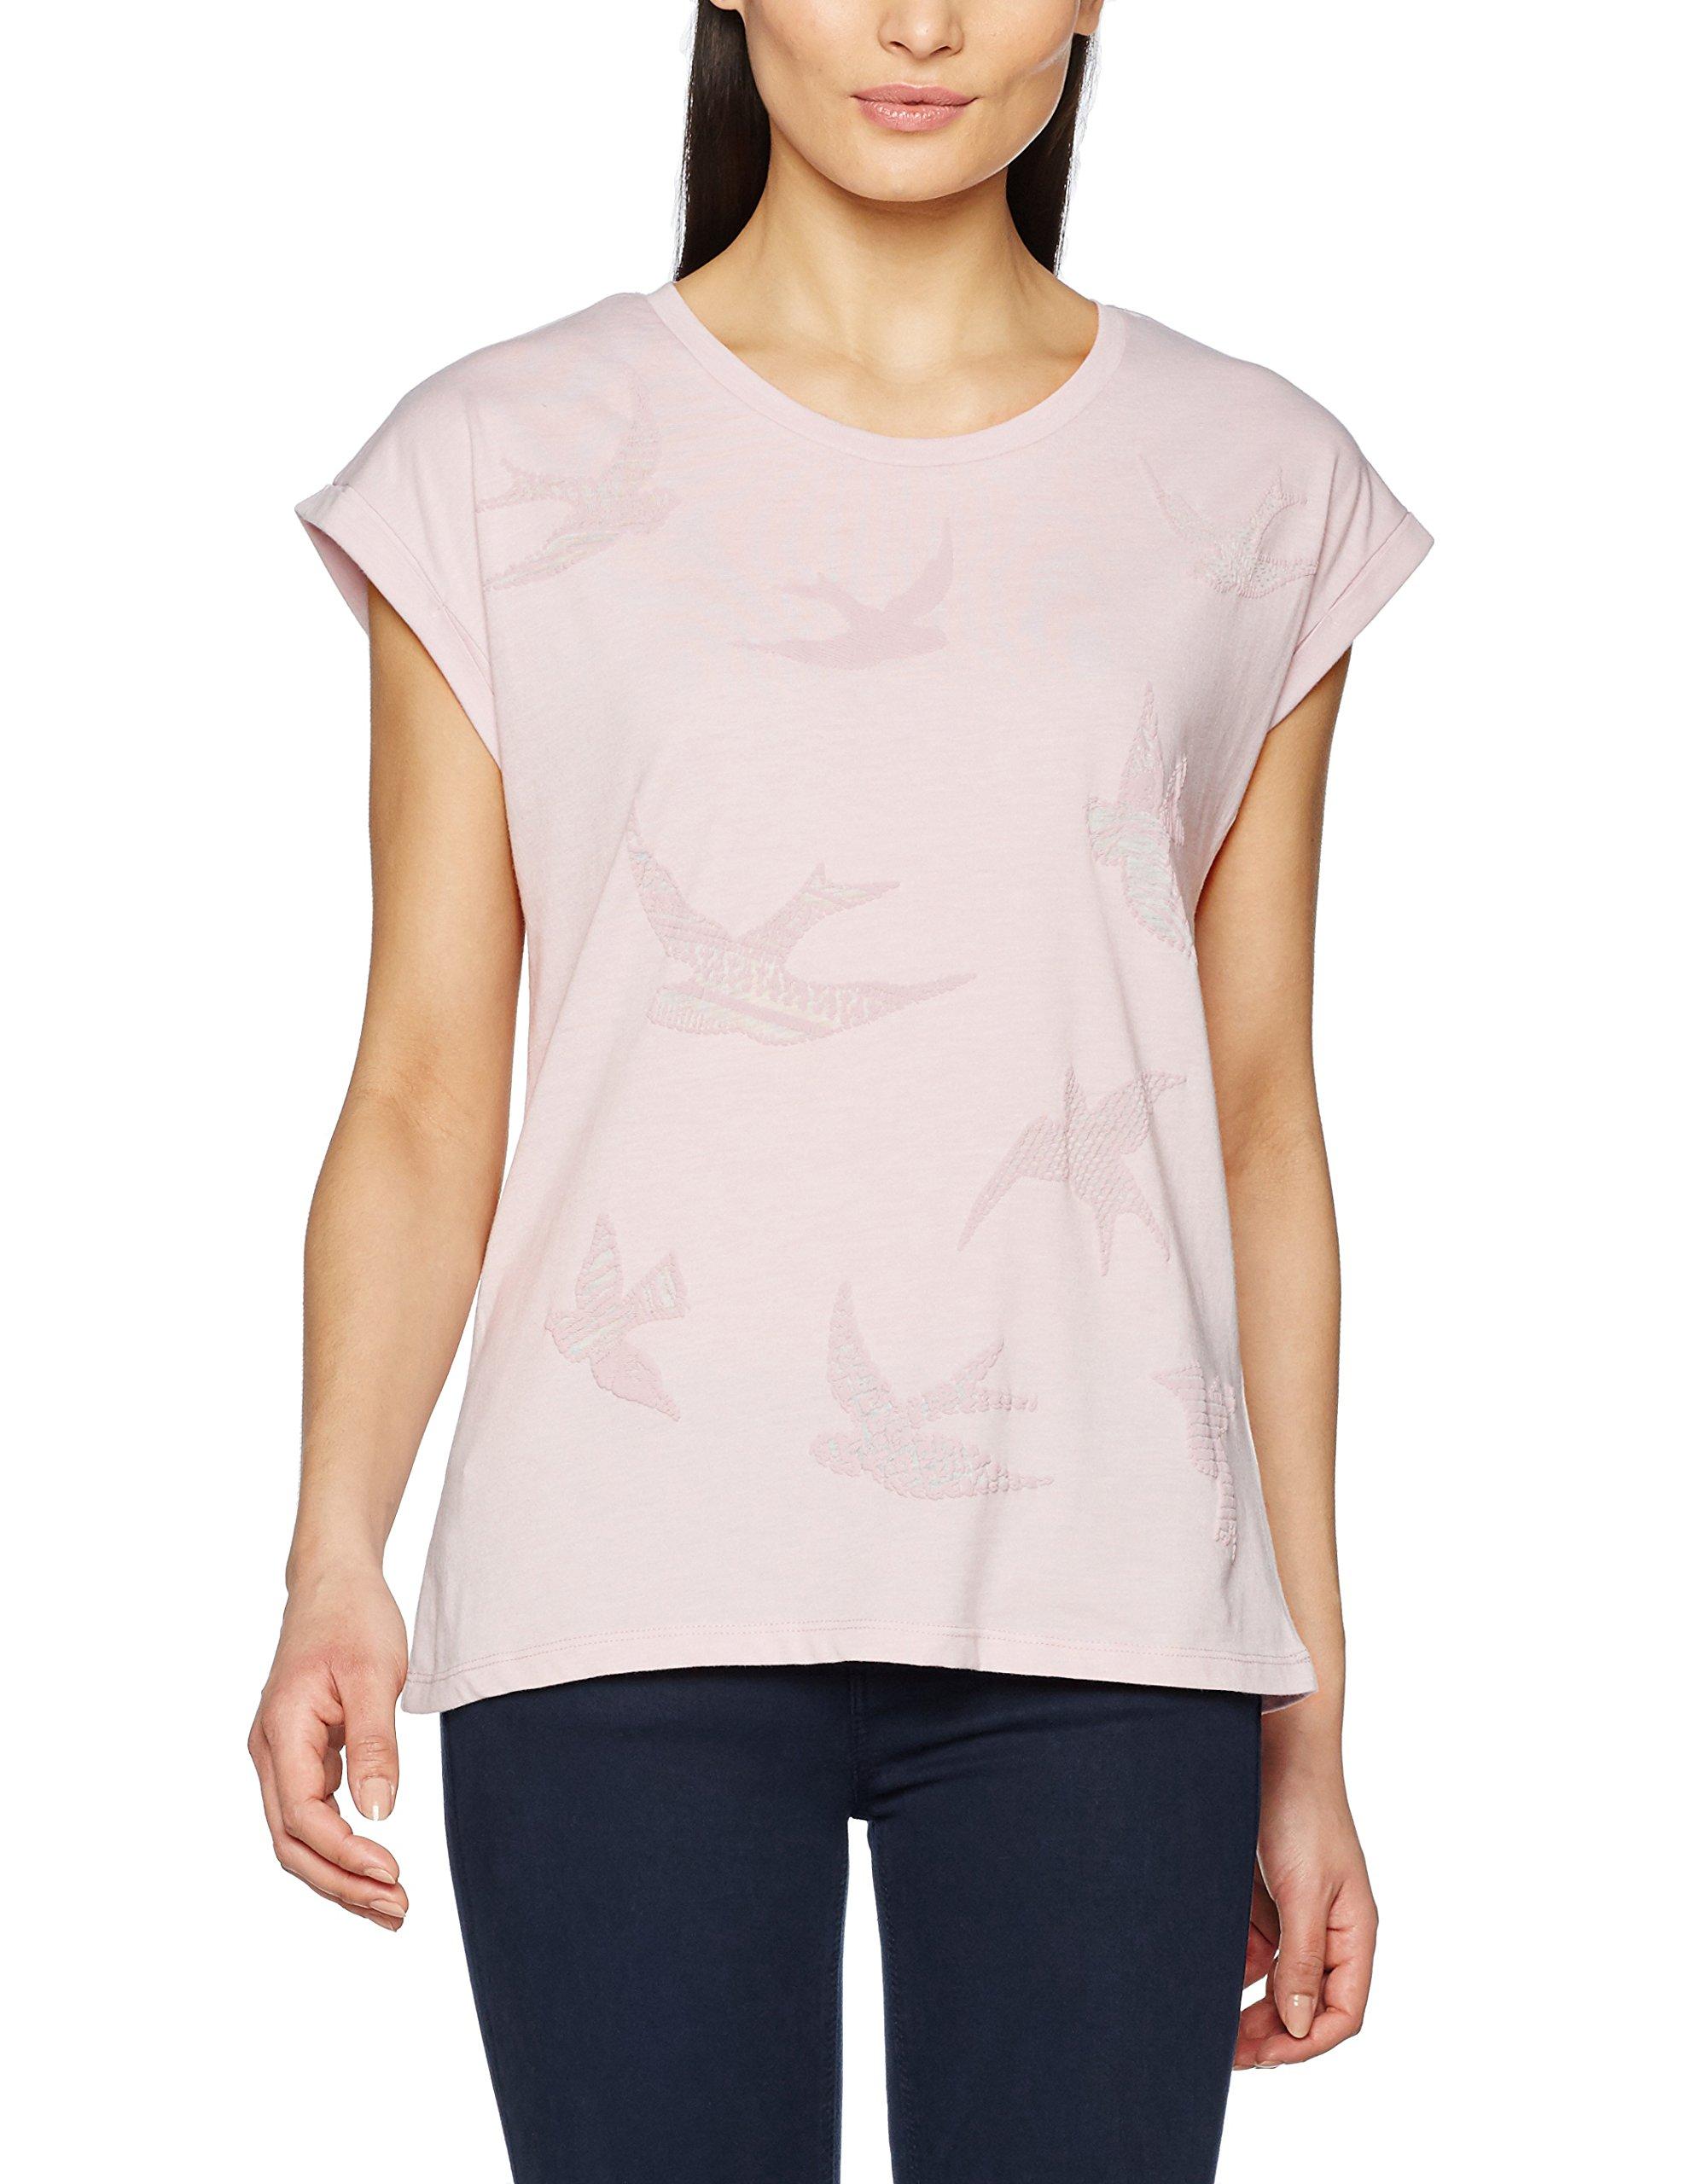 ESPRIT 037ee1k010, T-Shirt Donna, Multicolore (Old Pink), 40 (Taglia Produttore: Large)